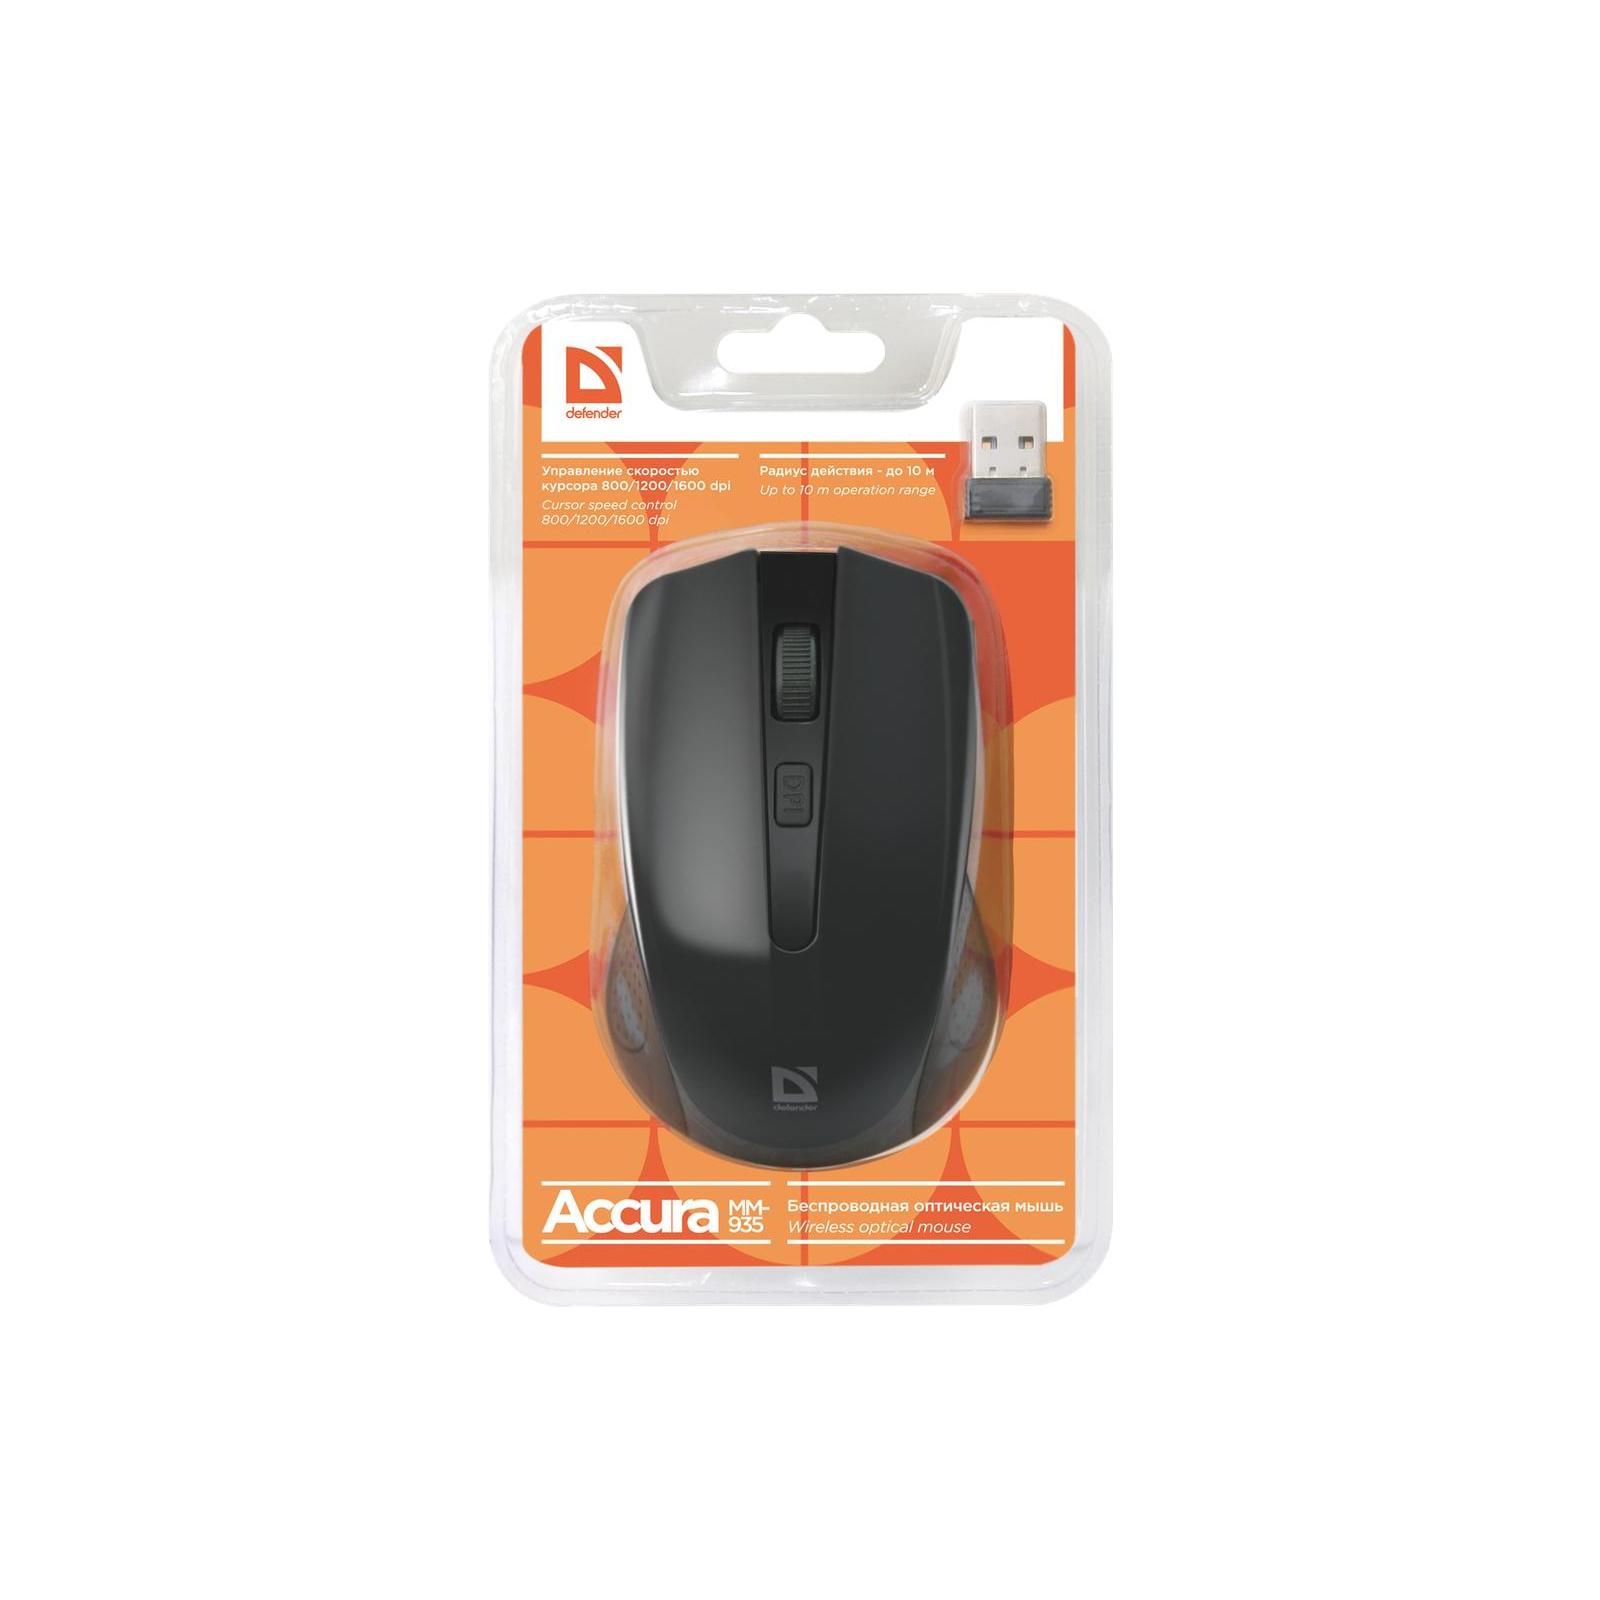 Мышка Defender Accura MM-935 Black (52935) изображение 4